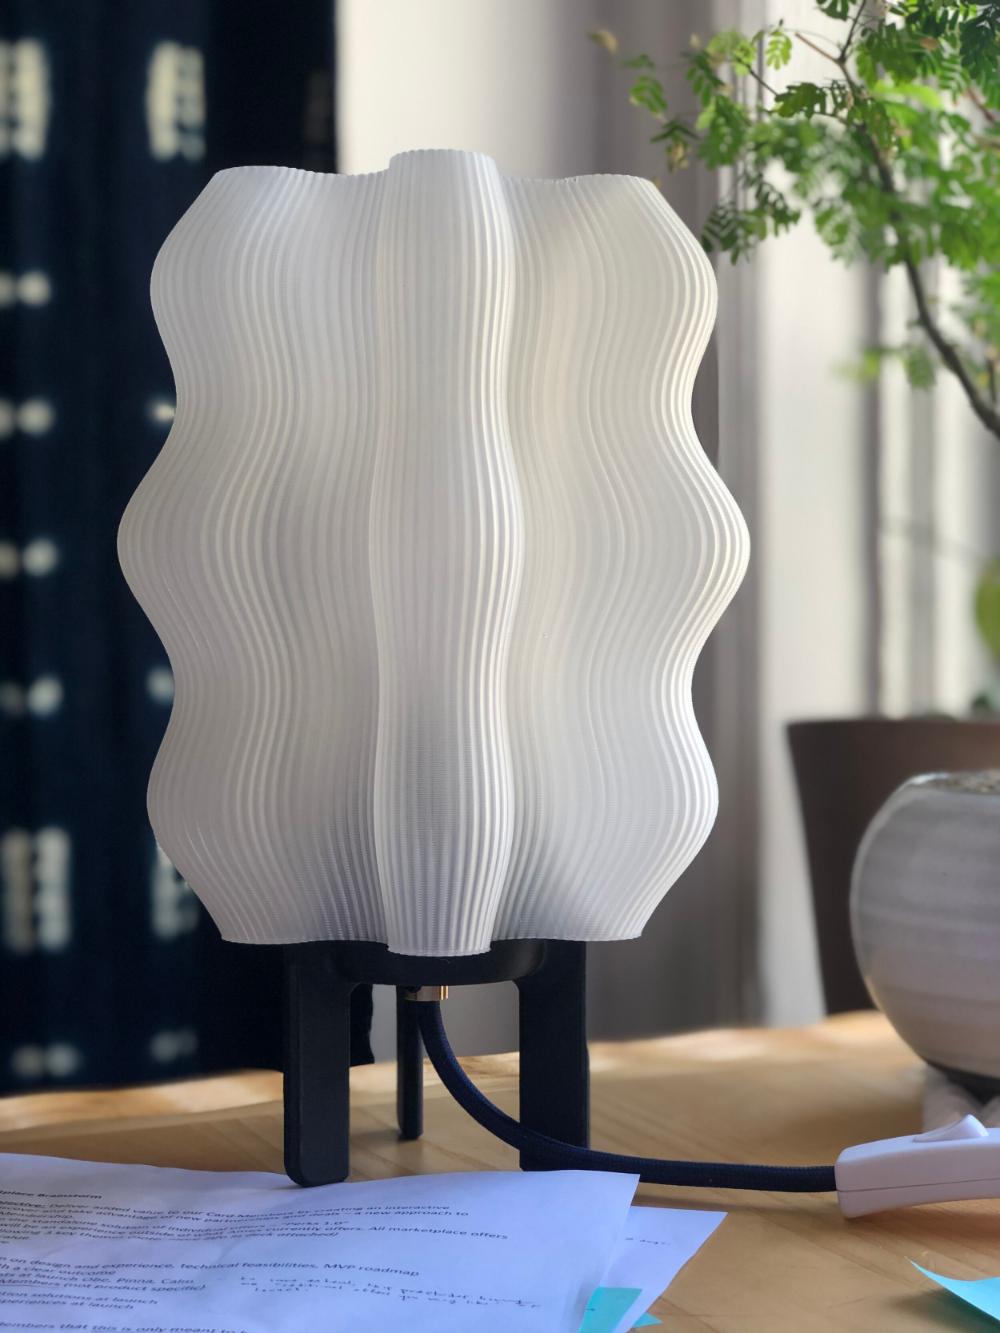 Wavy Lamp Wooj In 2020 Lamp Wavy 3d Printing